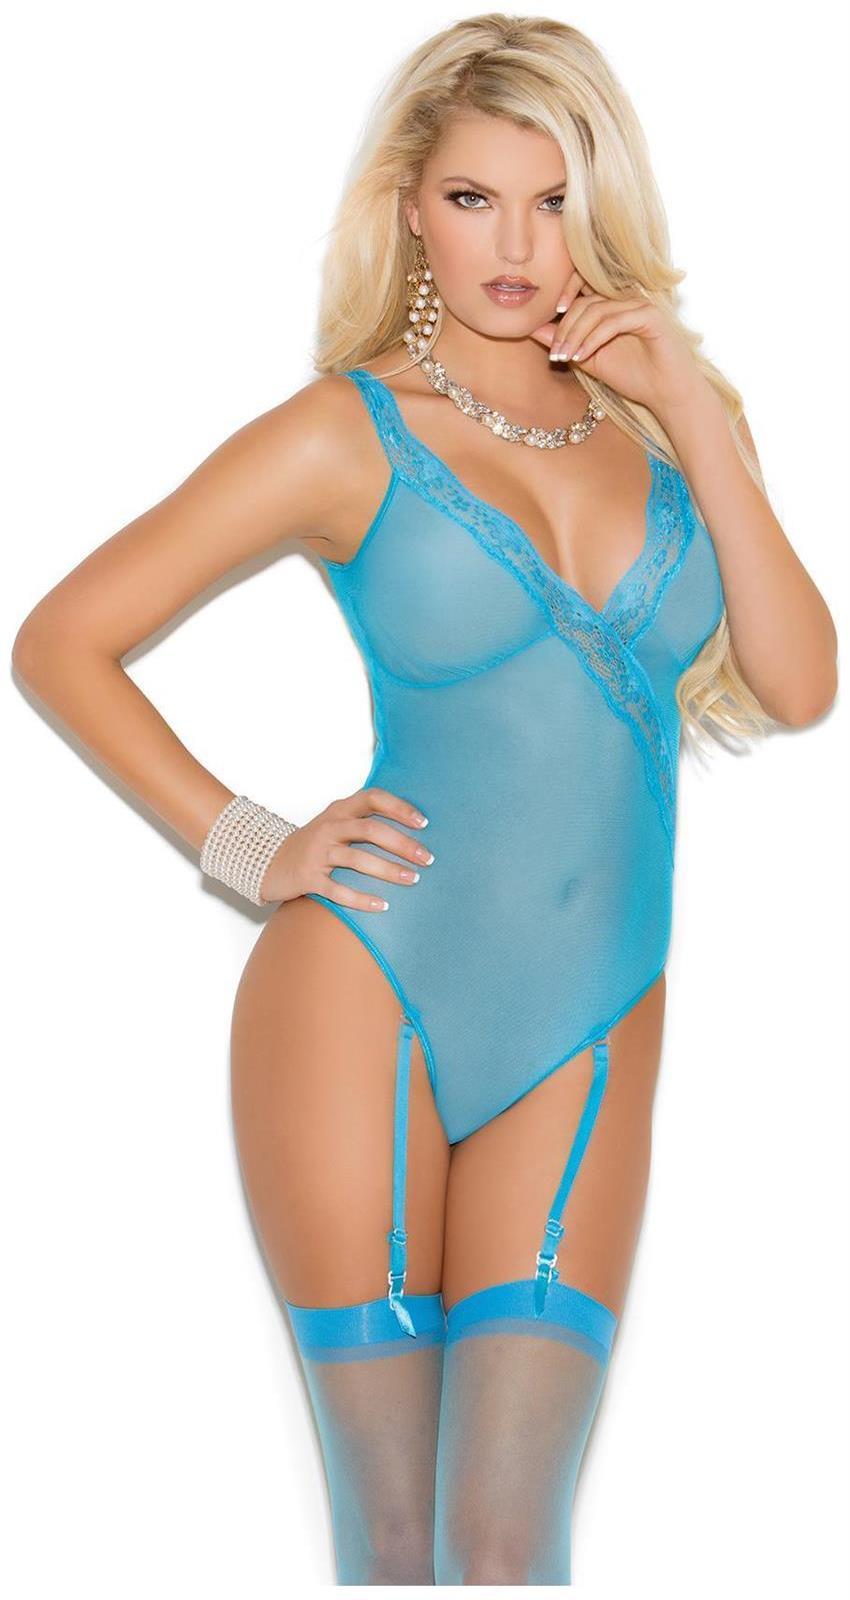 Women's Mesh teddiette - Crystal Blue - L SL-113426